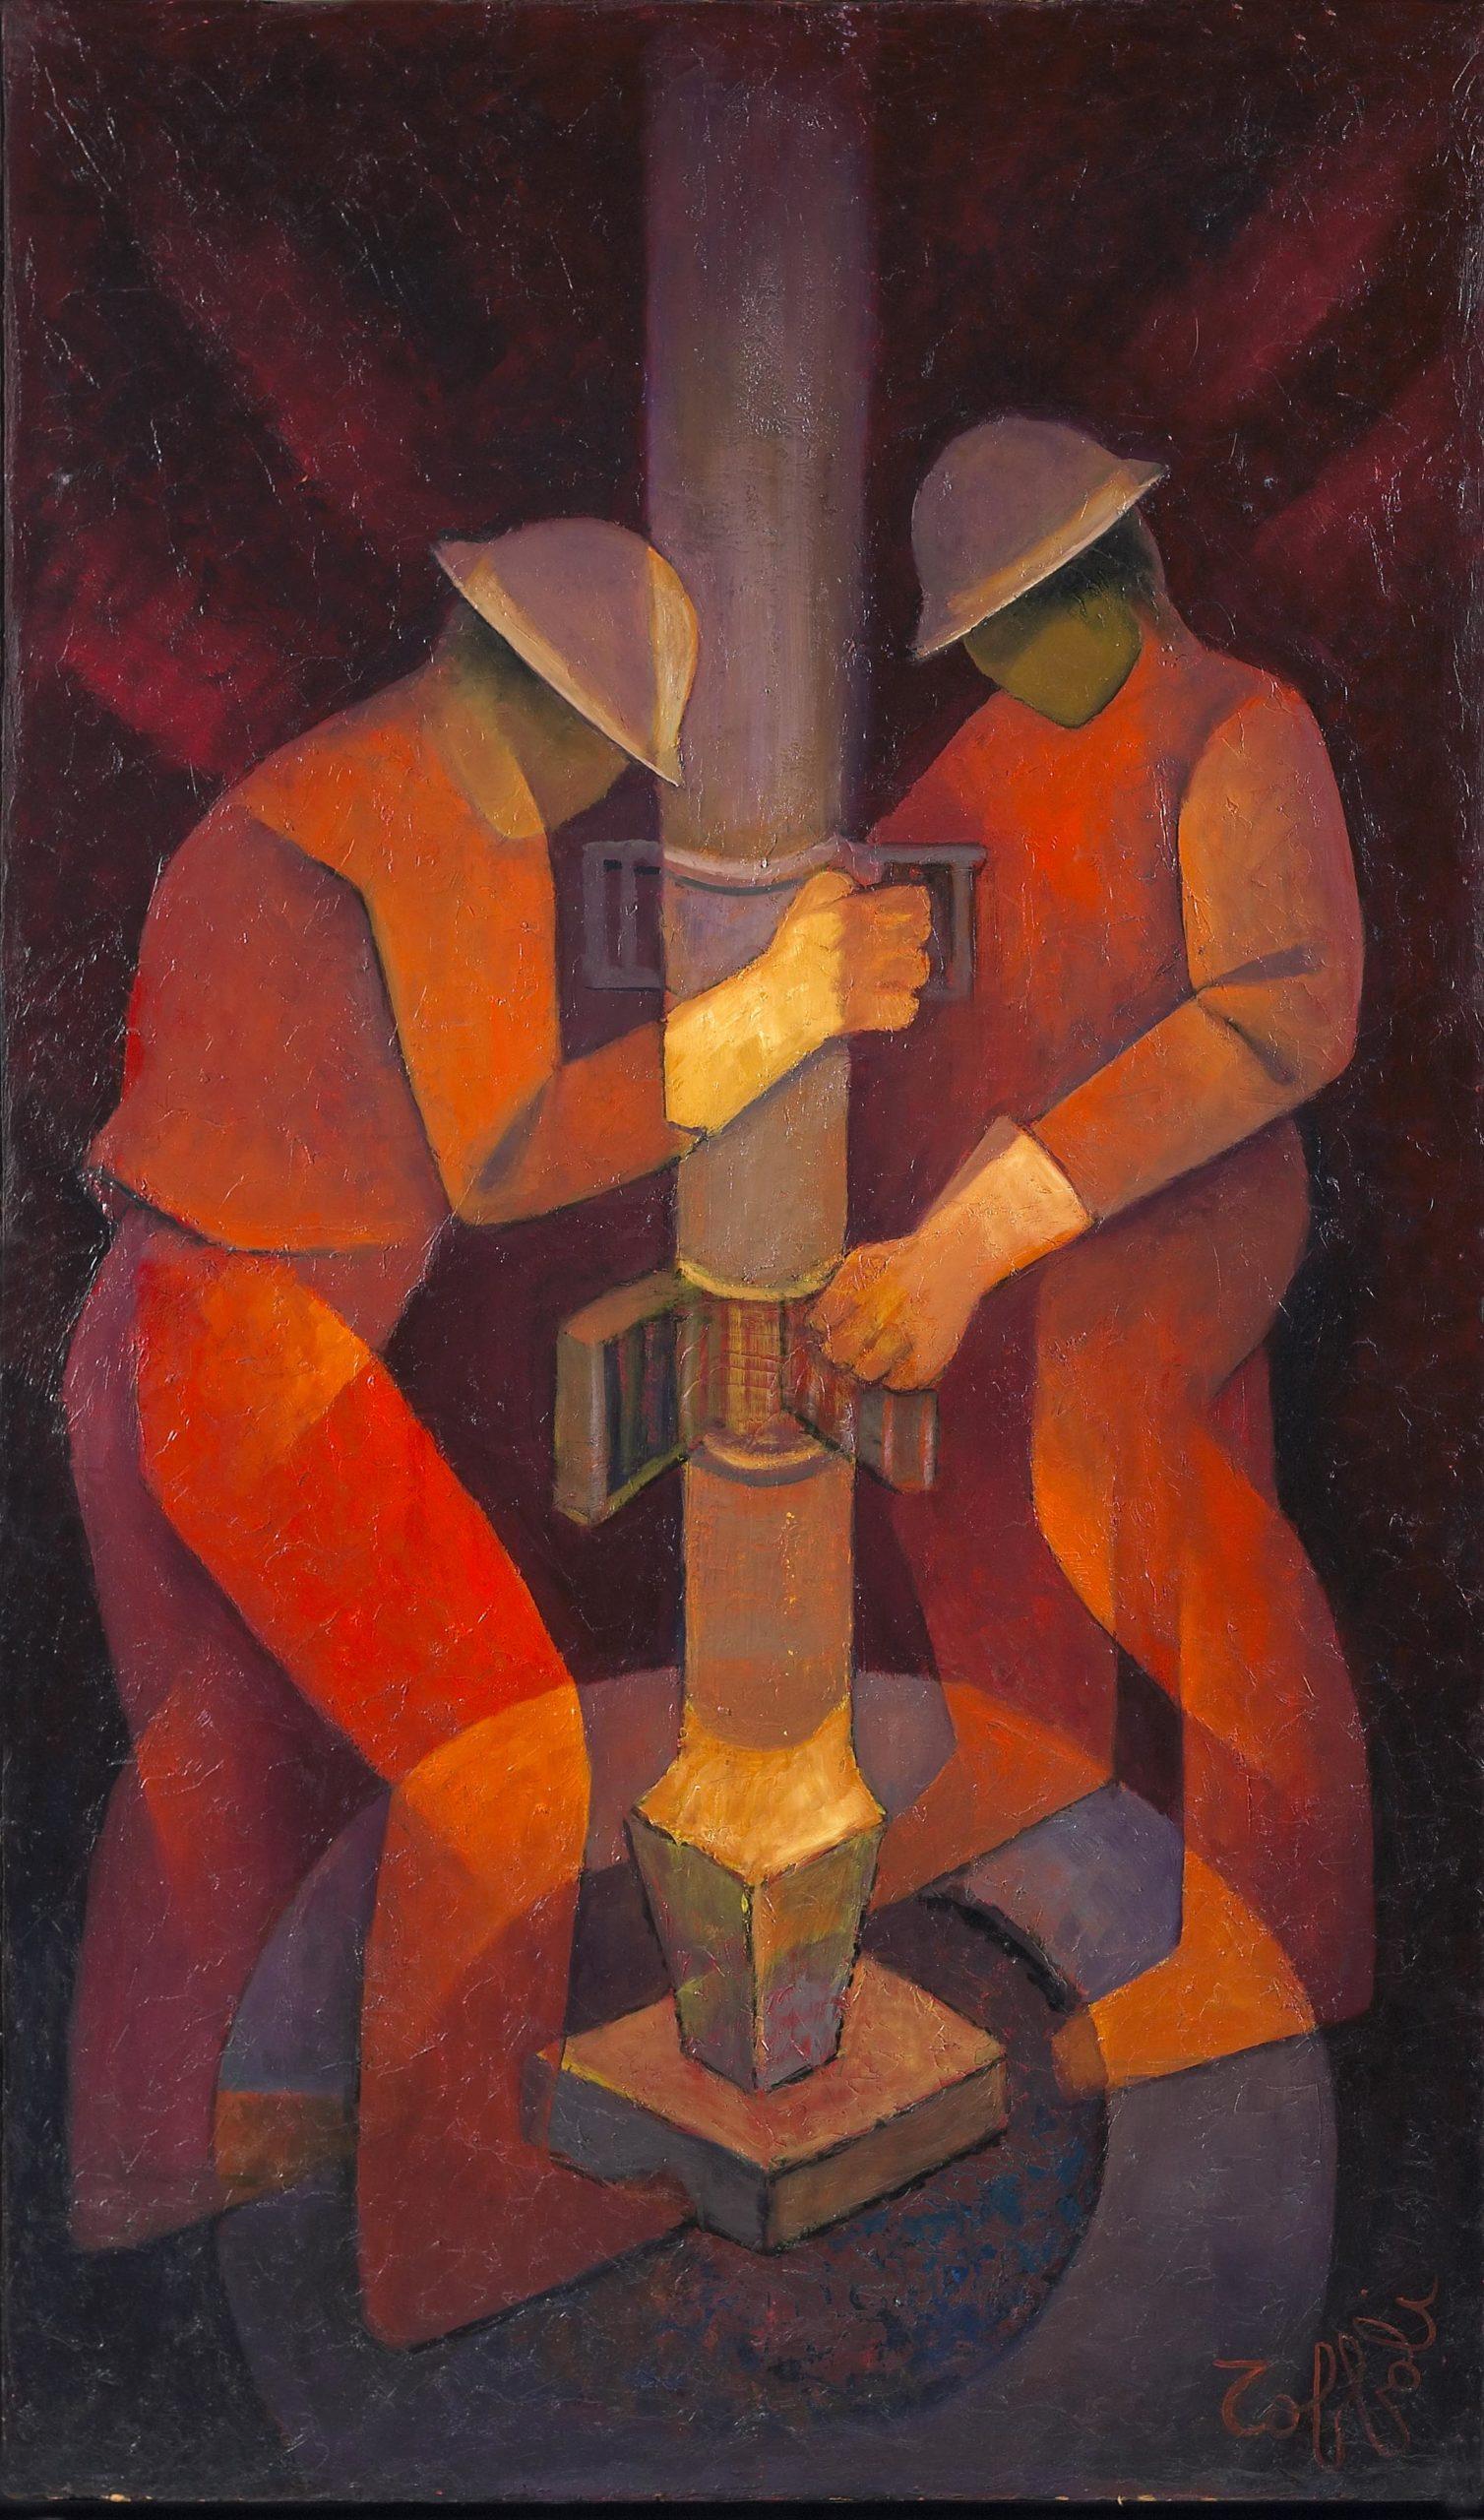 Louis Toffoli - Forage 1978 - 162x97cm